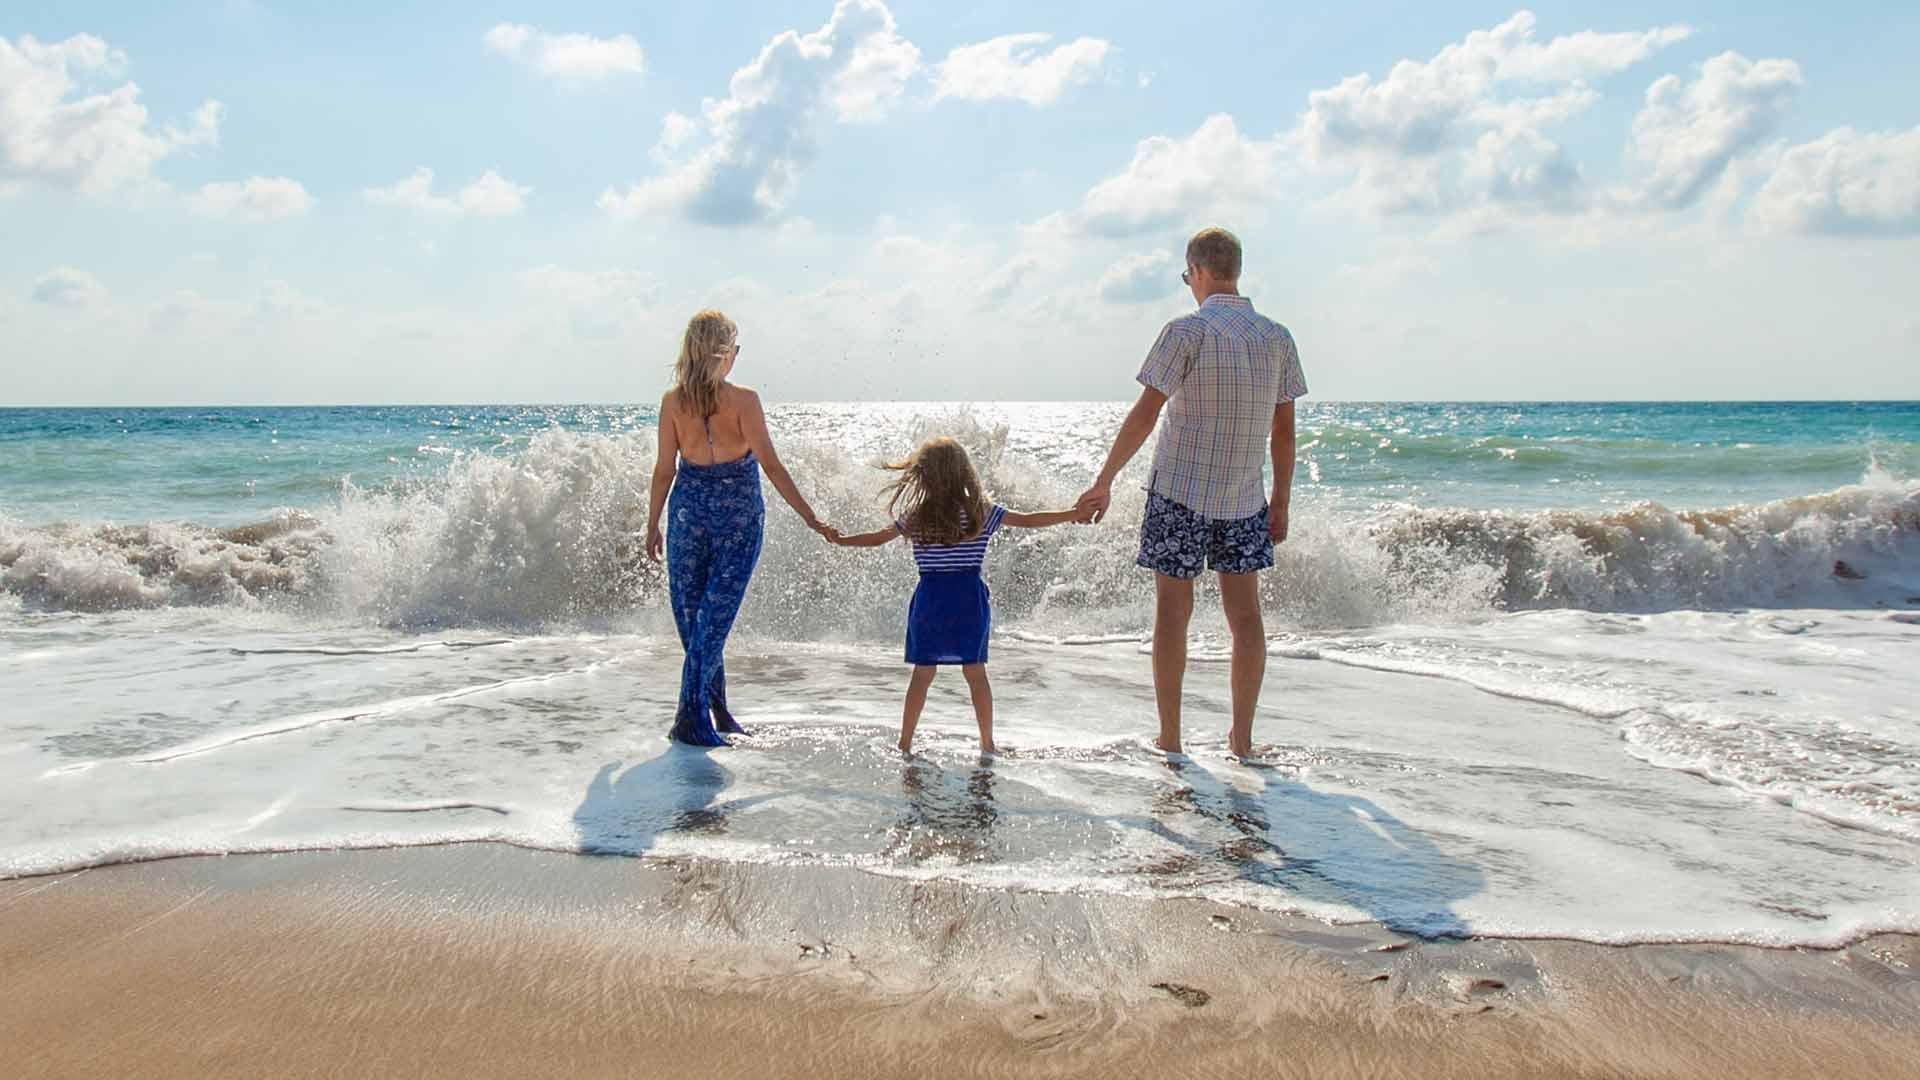 Family n he beach